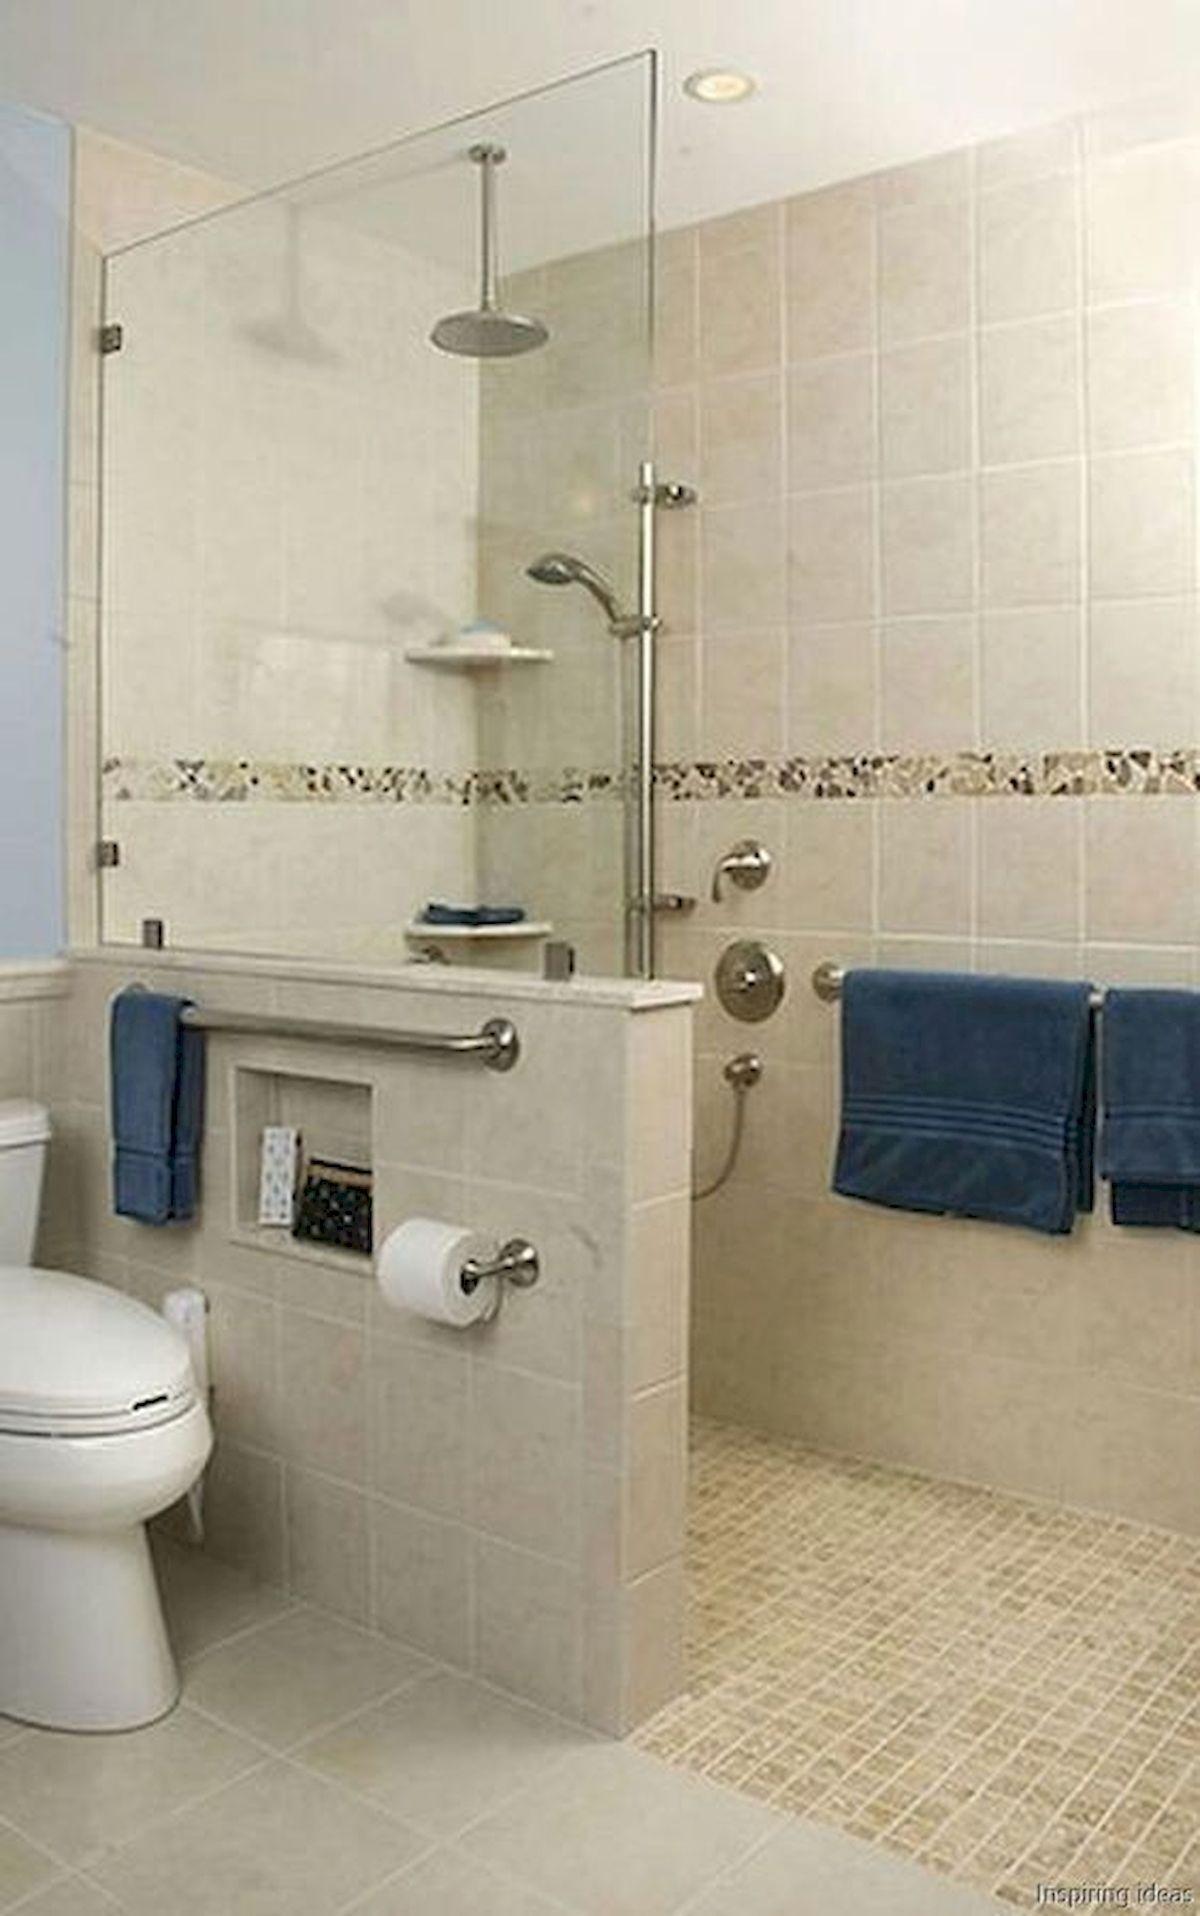 Half Bathroom Remodel In 2020 20 Amazing Ideas And Galleries In 2020 With Images Bathroom Layout Half Bathroom Remodel Bathroom Design